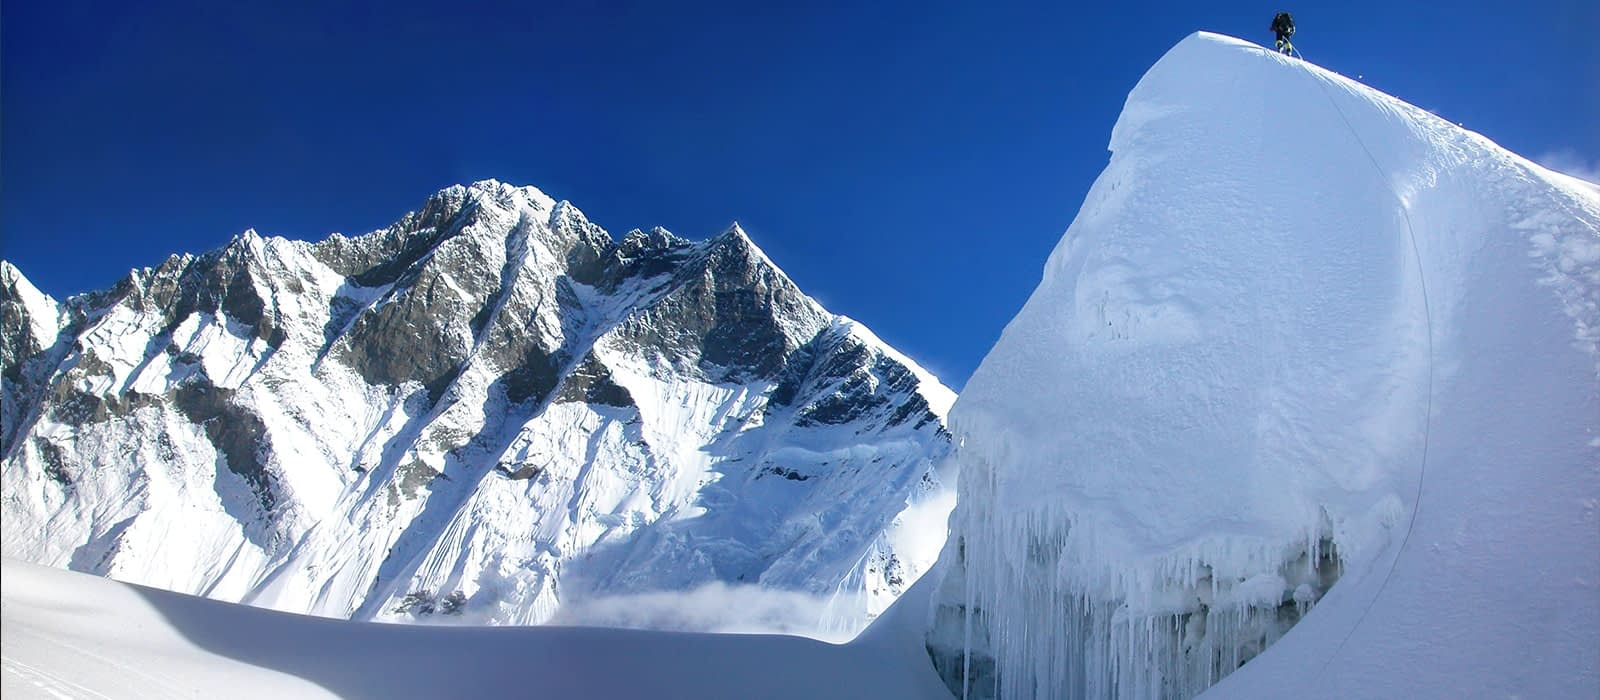 Lhotse Expedition – Nepal